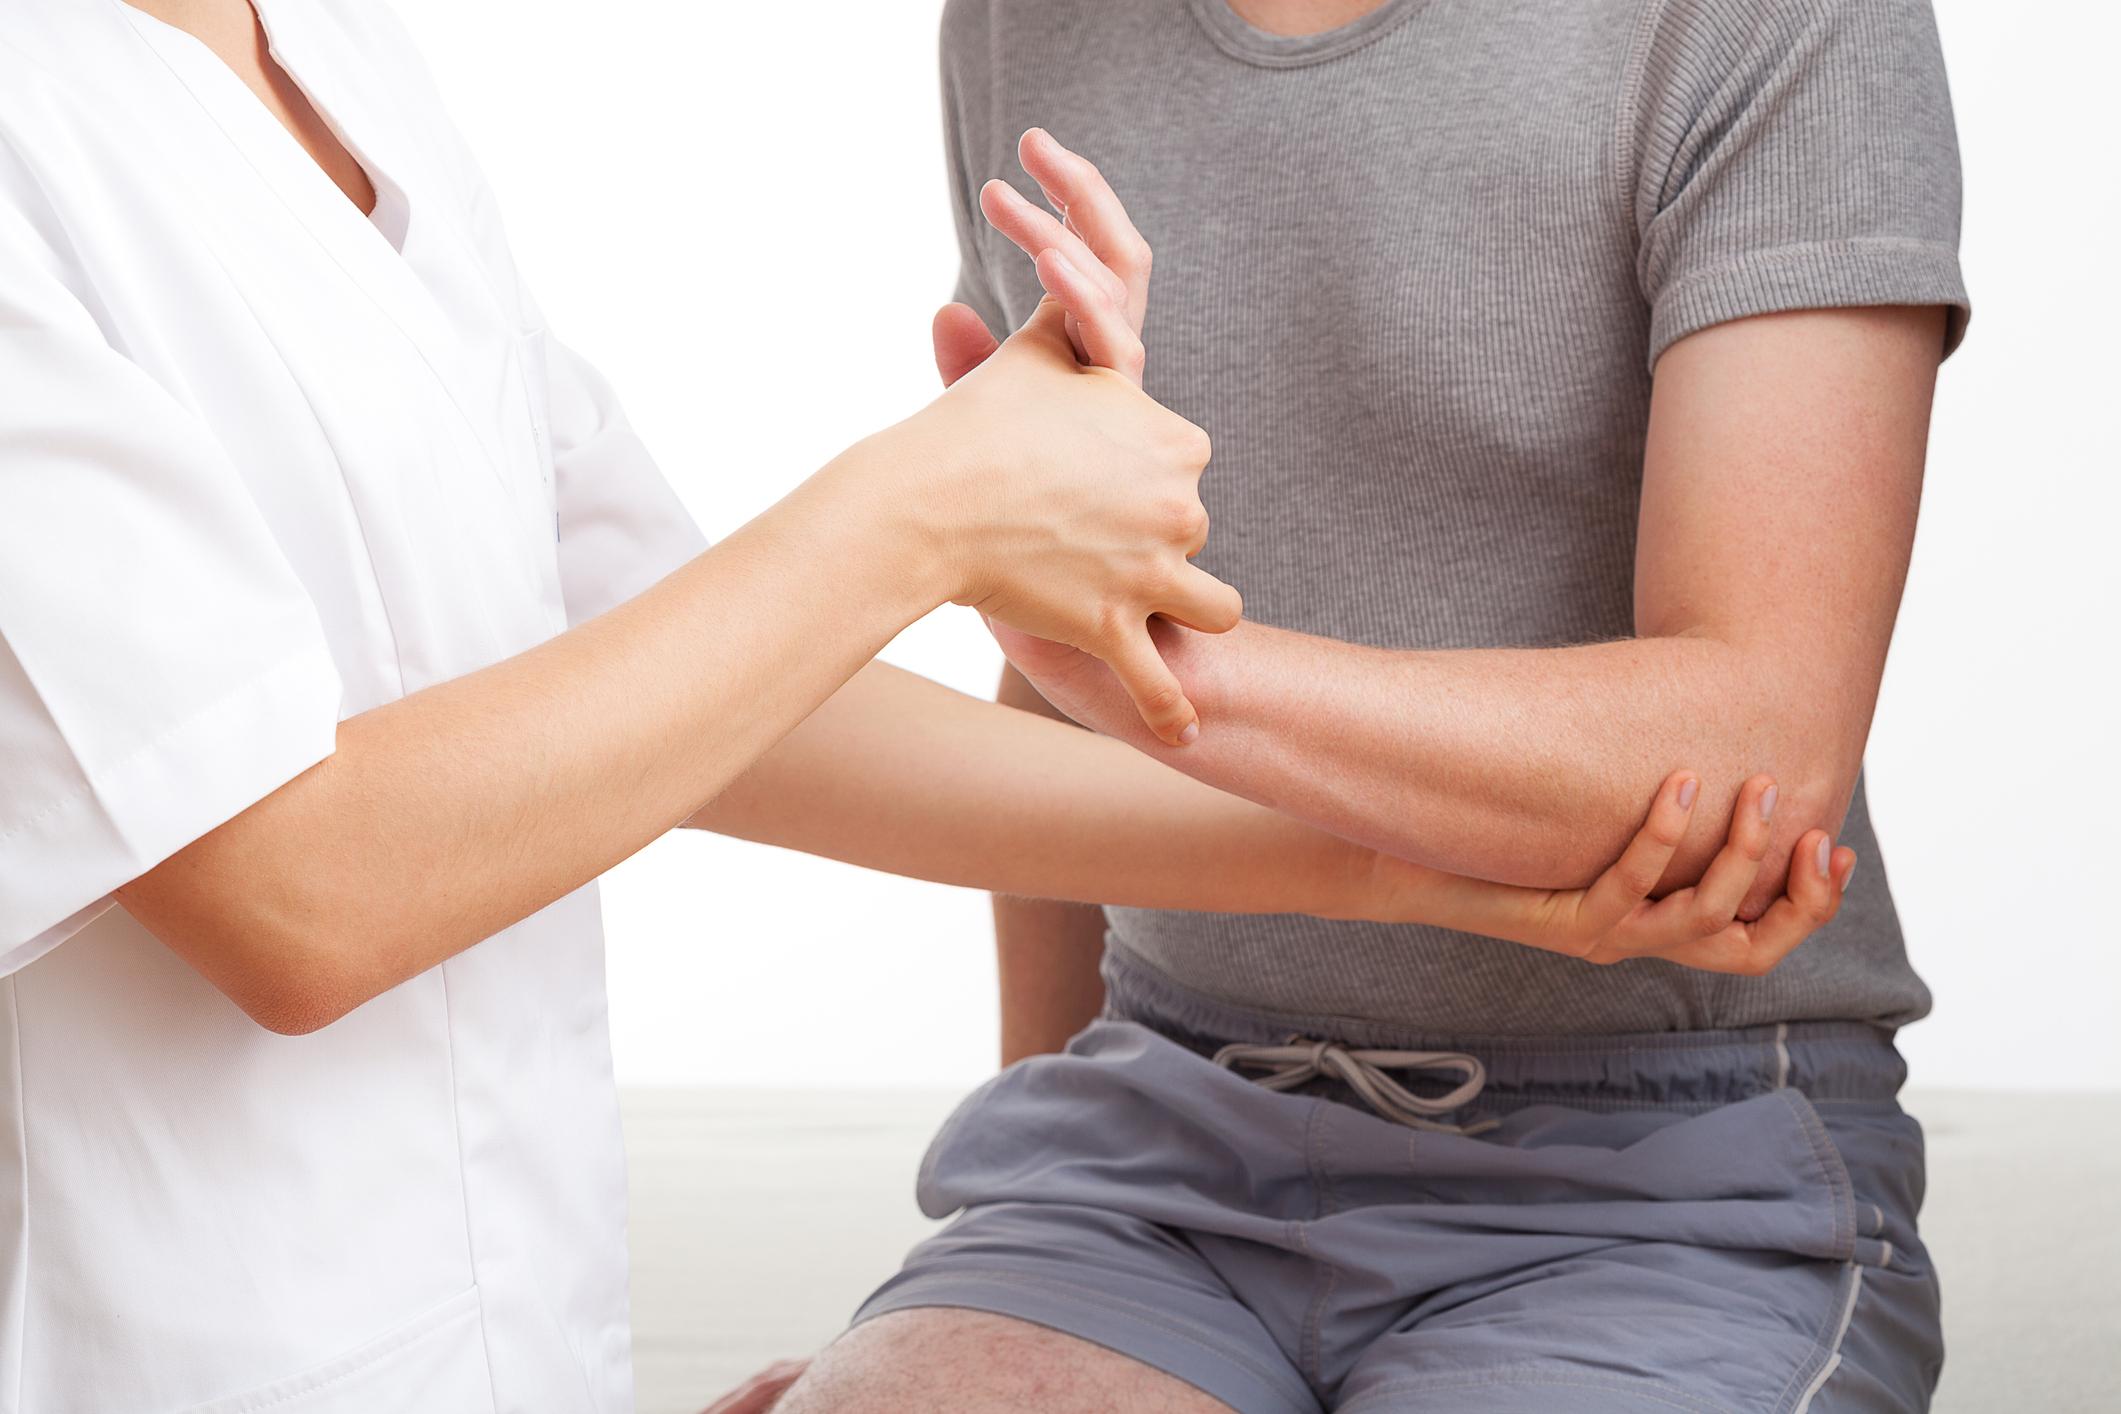 Sports Medicine Doctors in Hammonton